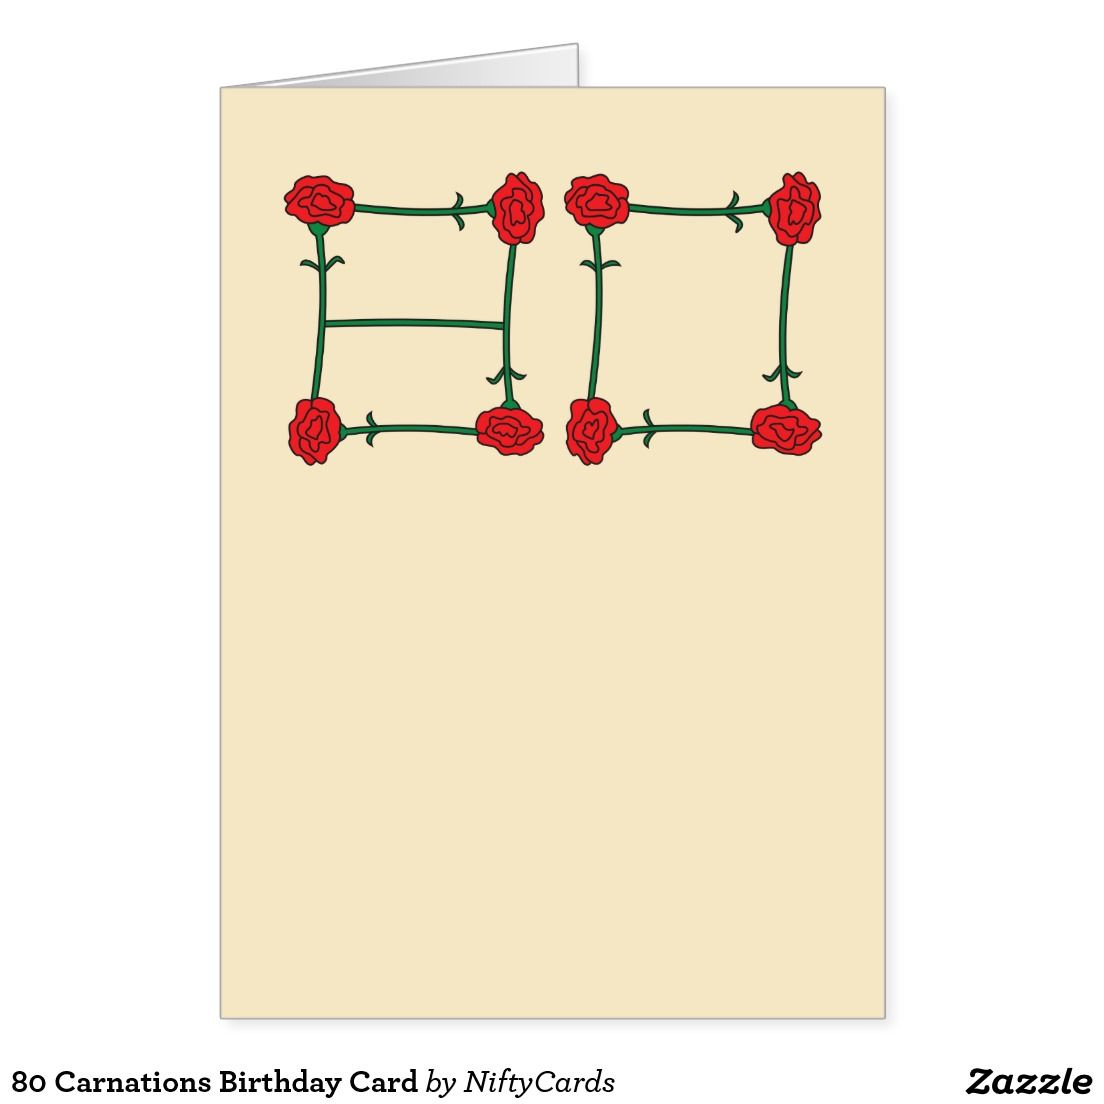 80 Carnations Birthday Card